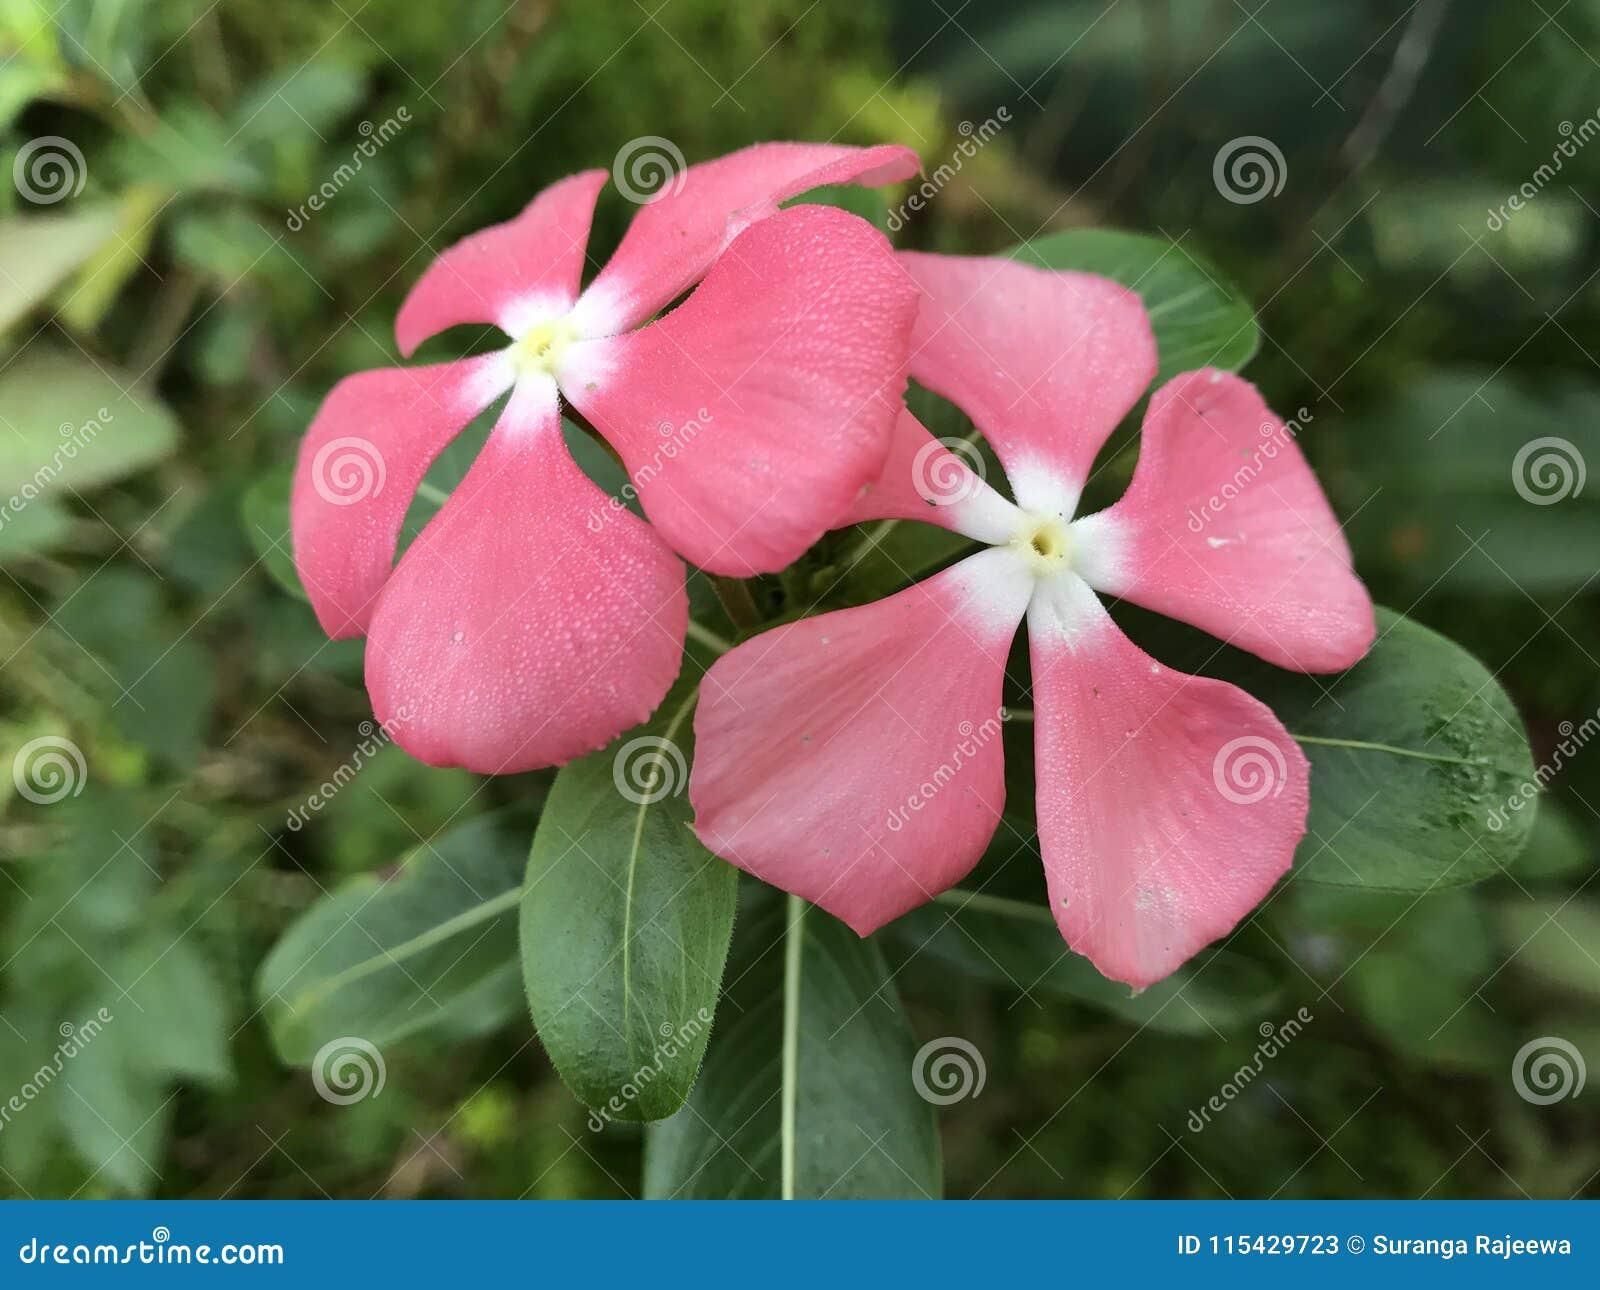 Sri Lankan Beautiful Flowers Stock Image Image Of Constipation